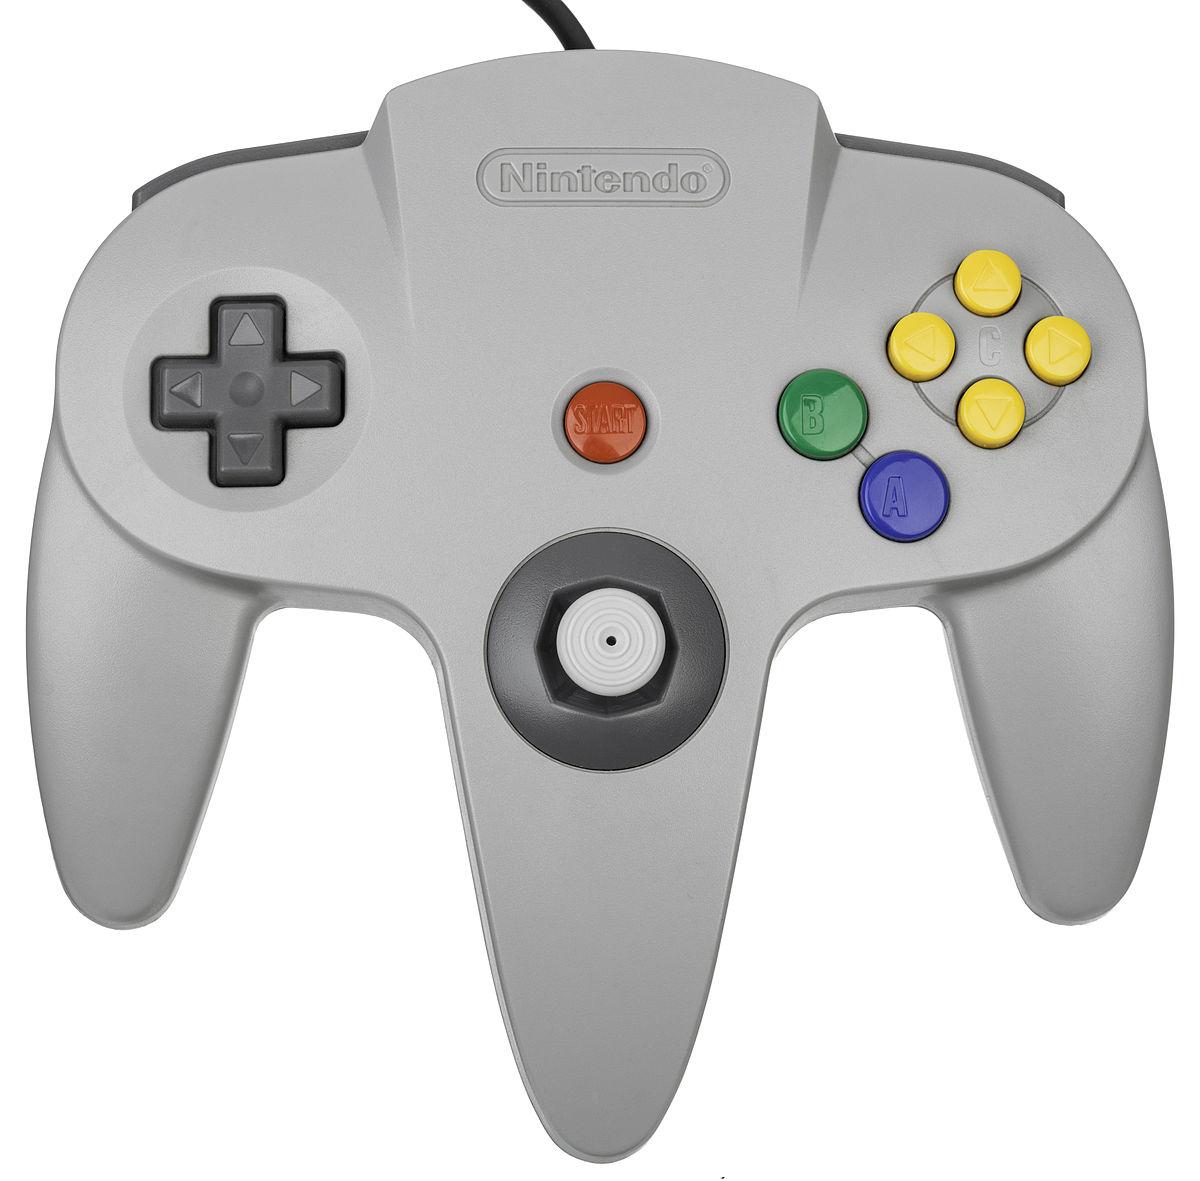 File:Nintendo-64-Controller-Gray-Flat.jpg - Wikimedia Commons